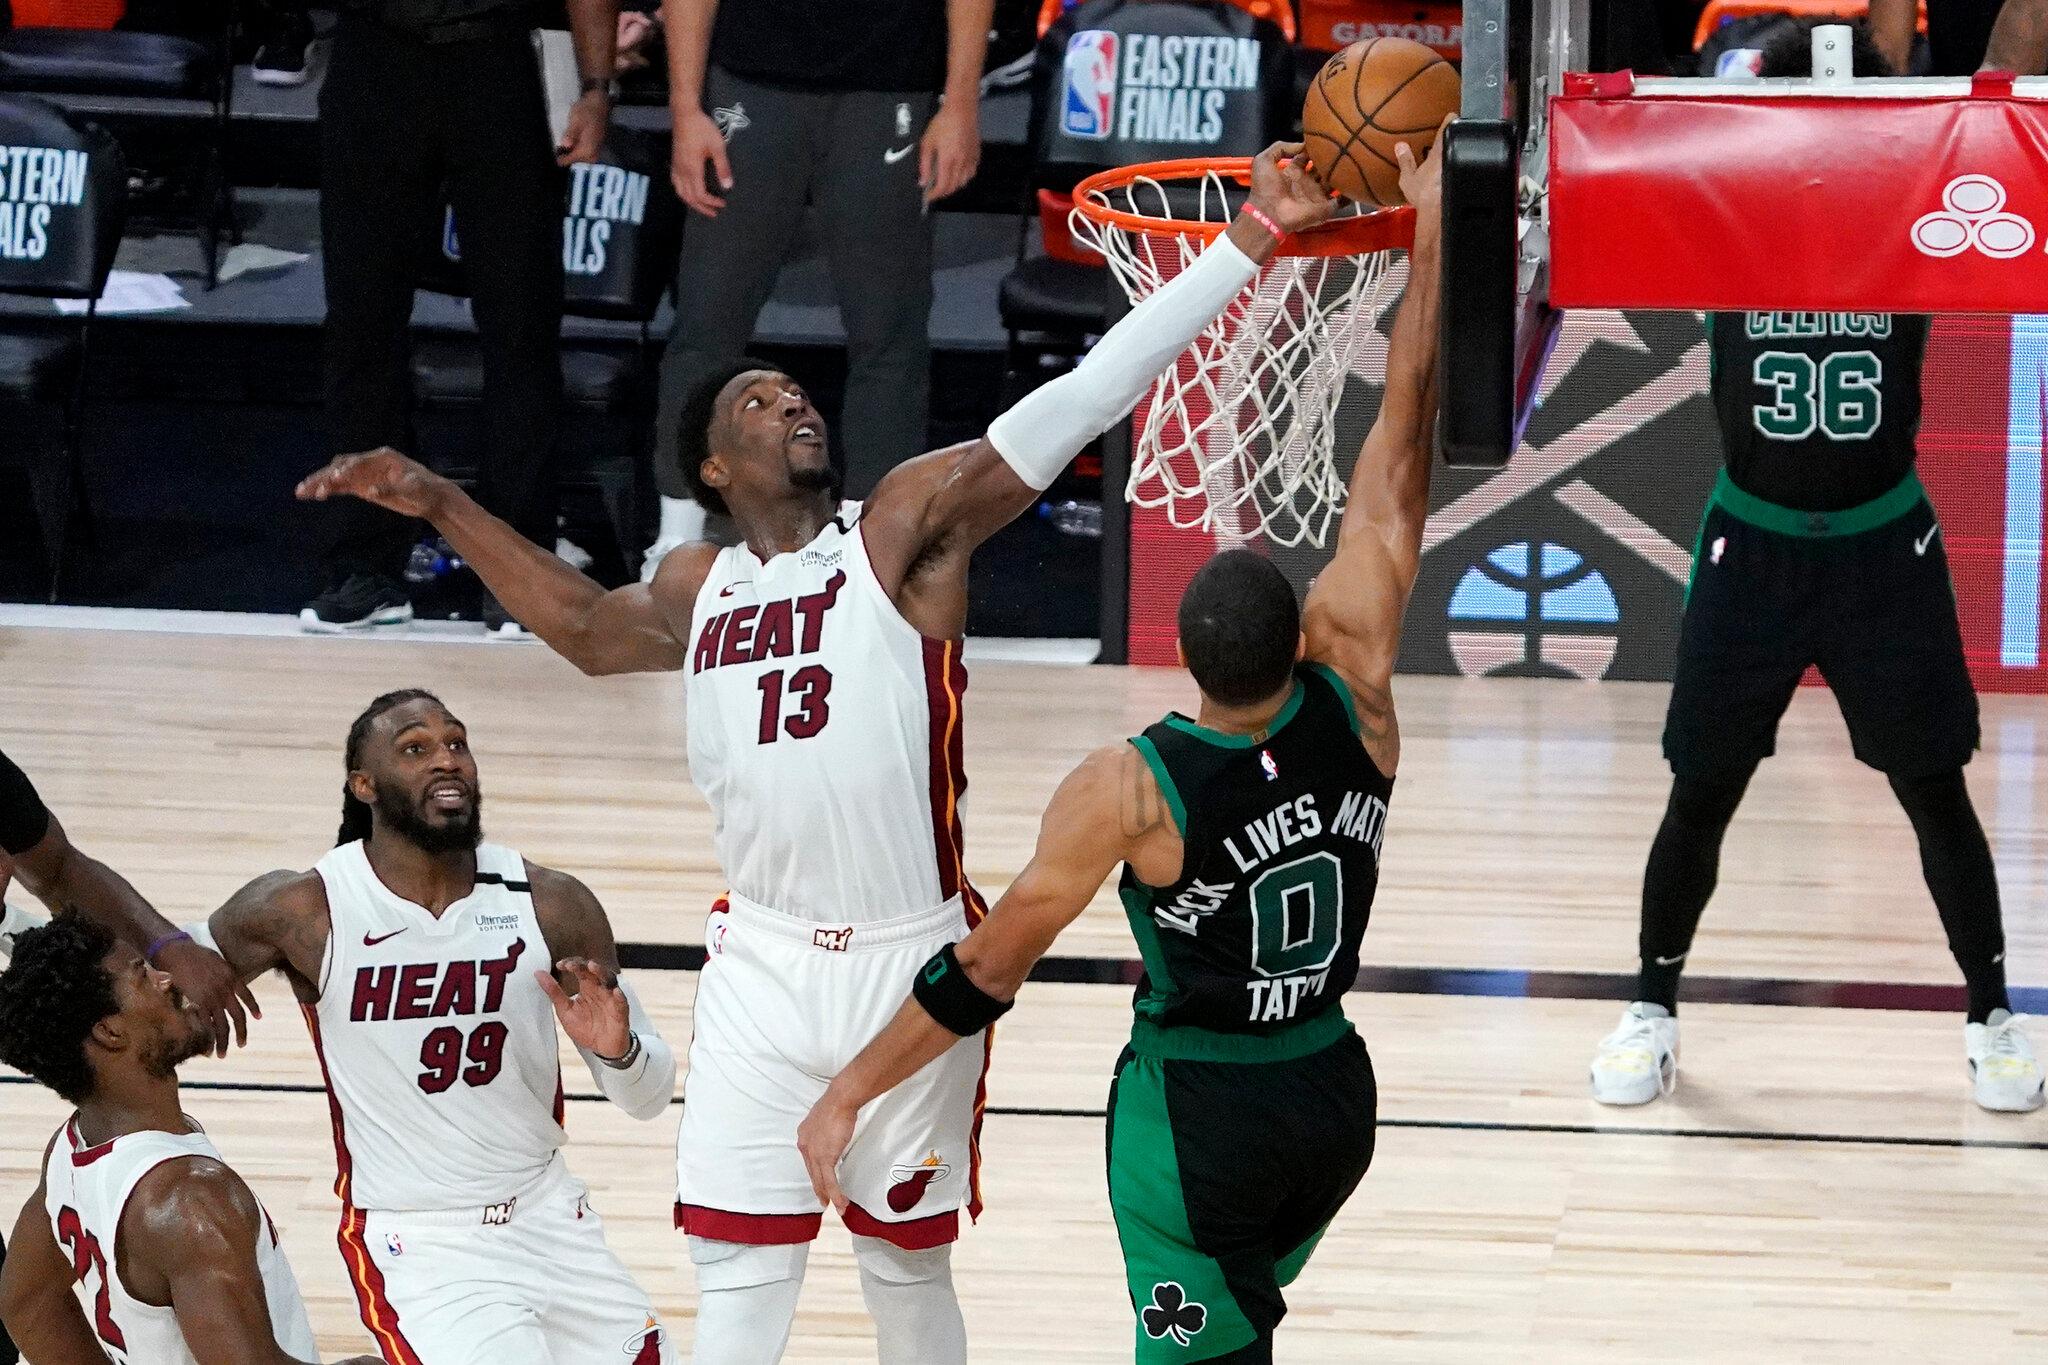 miami heat s bam adebayo blocks a dunk